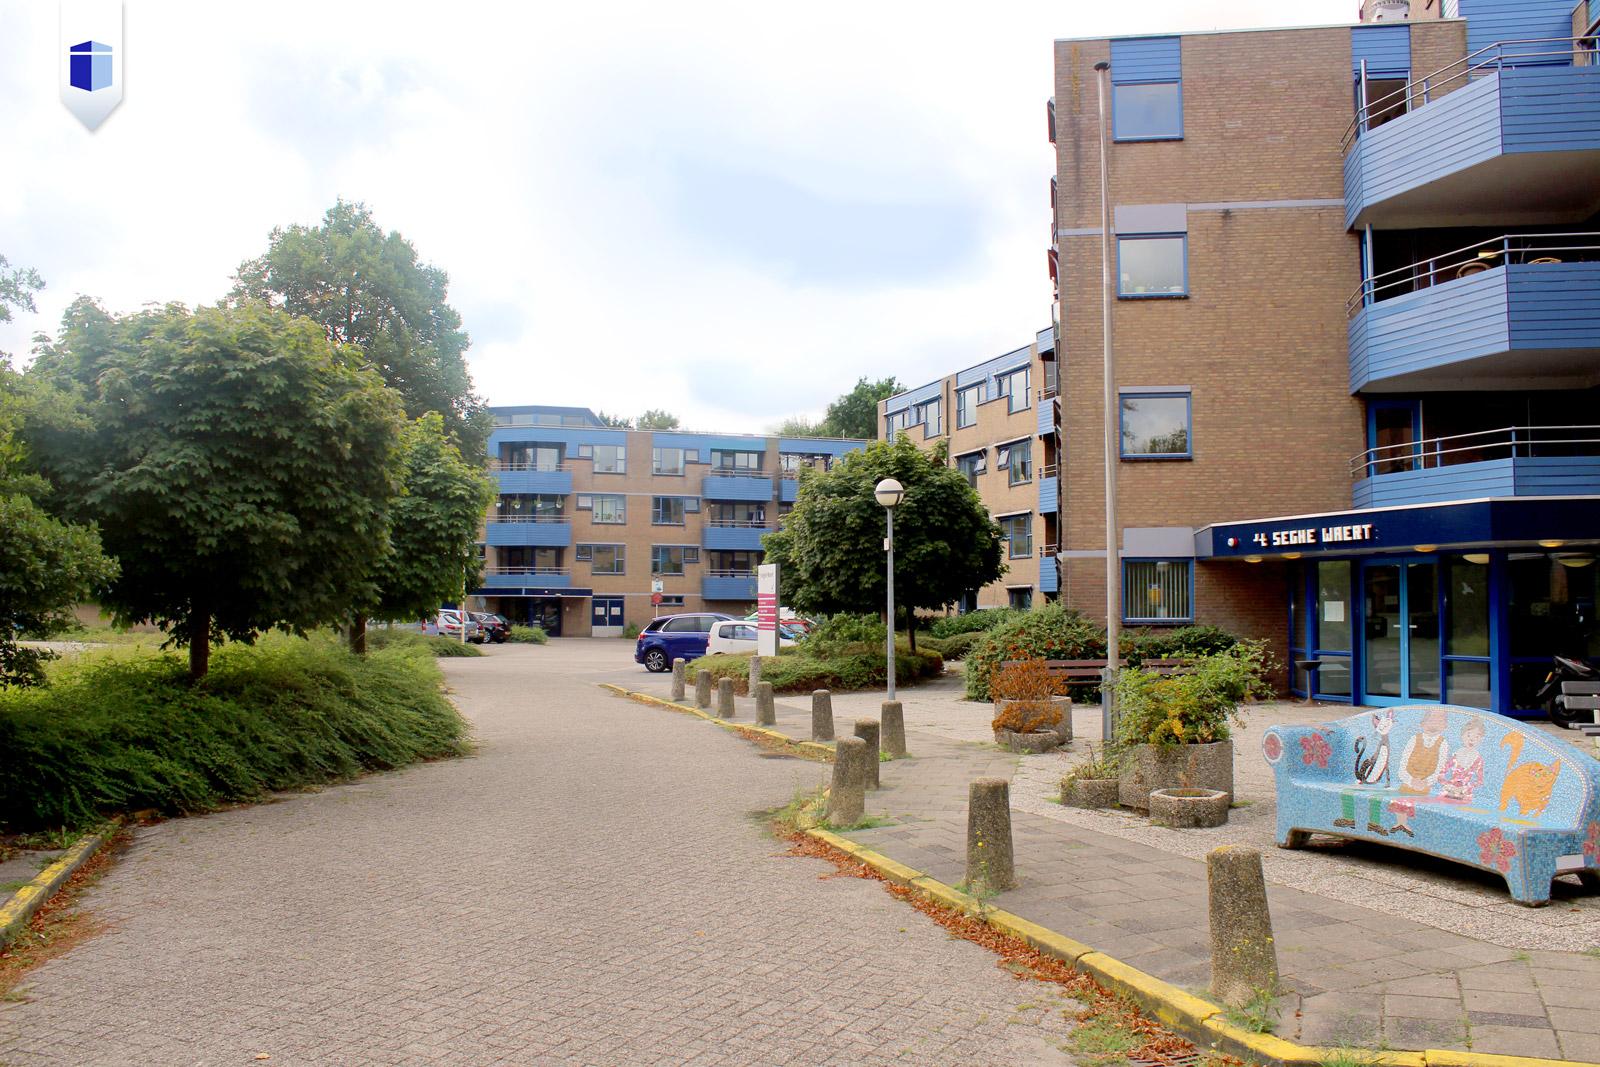 Studentenhuisvesting in 't Seghe Waert